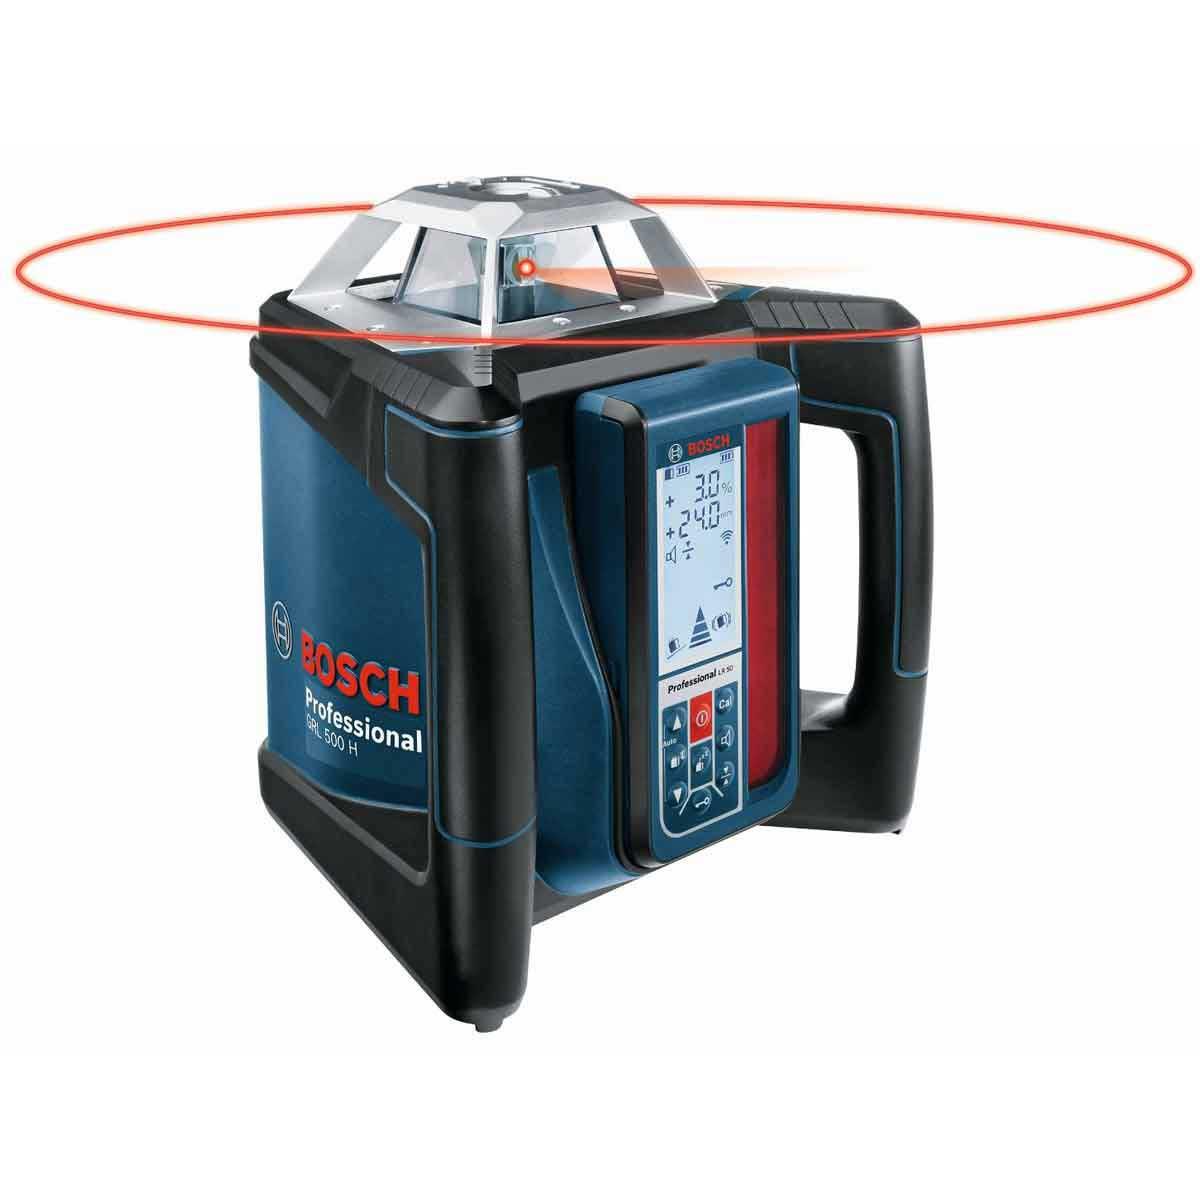 360 degree GRL 500 Bosch Self-Leveling Rotary Laser Kit